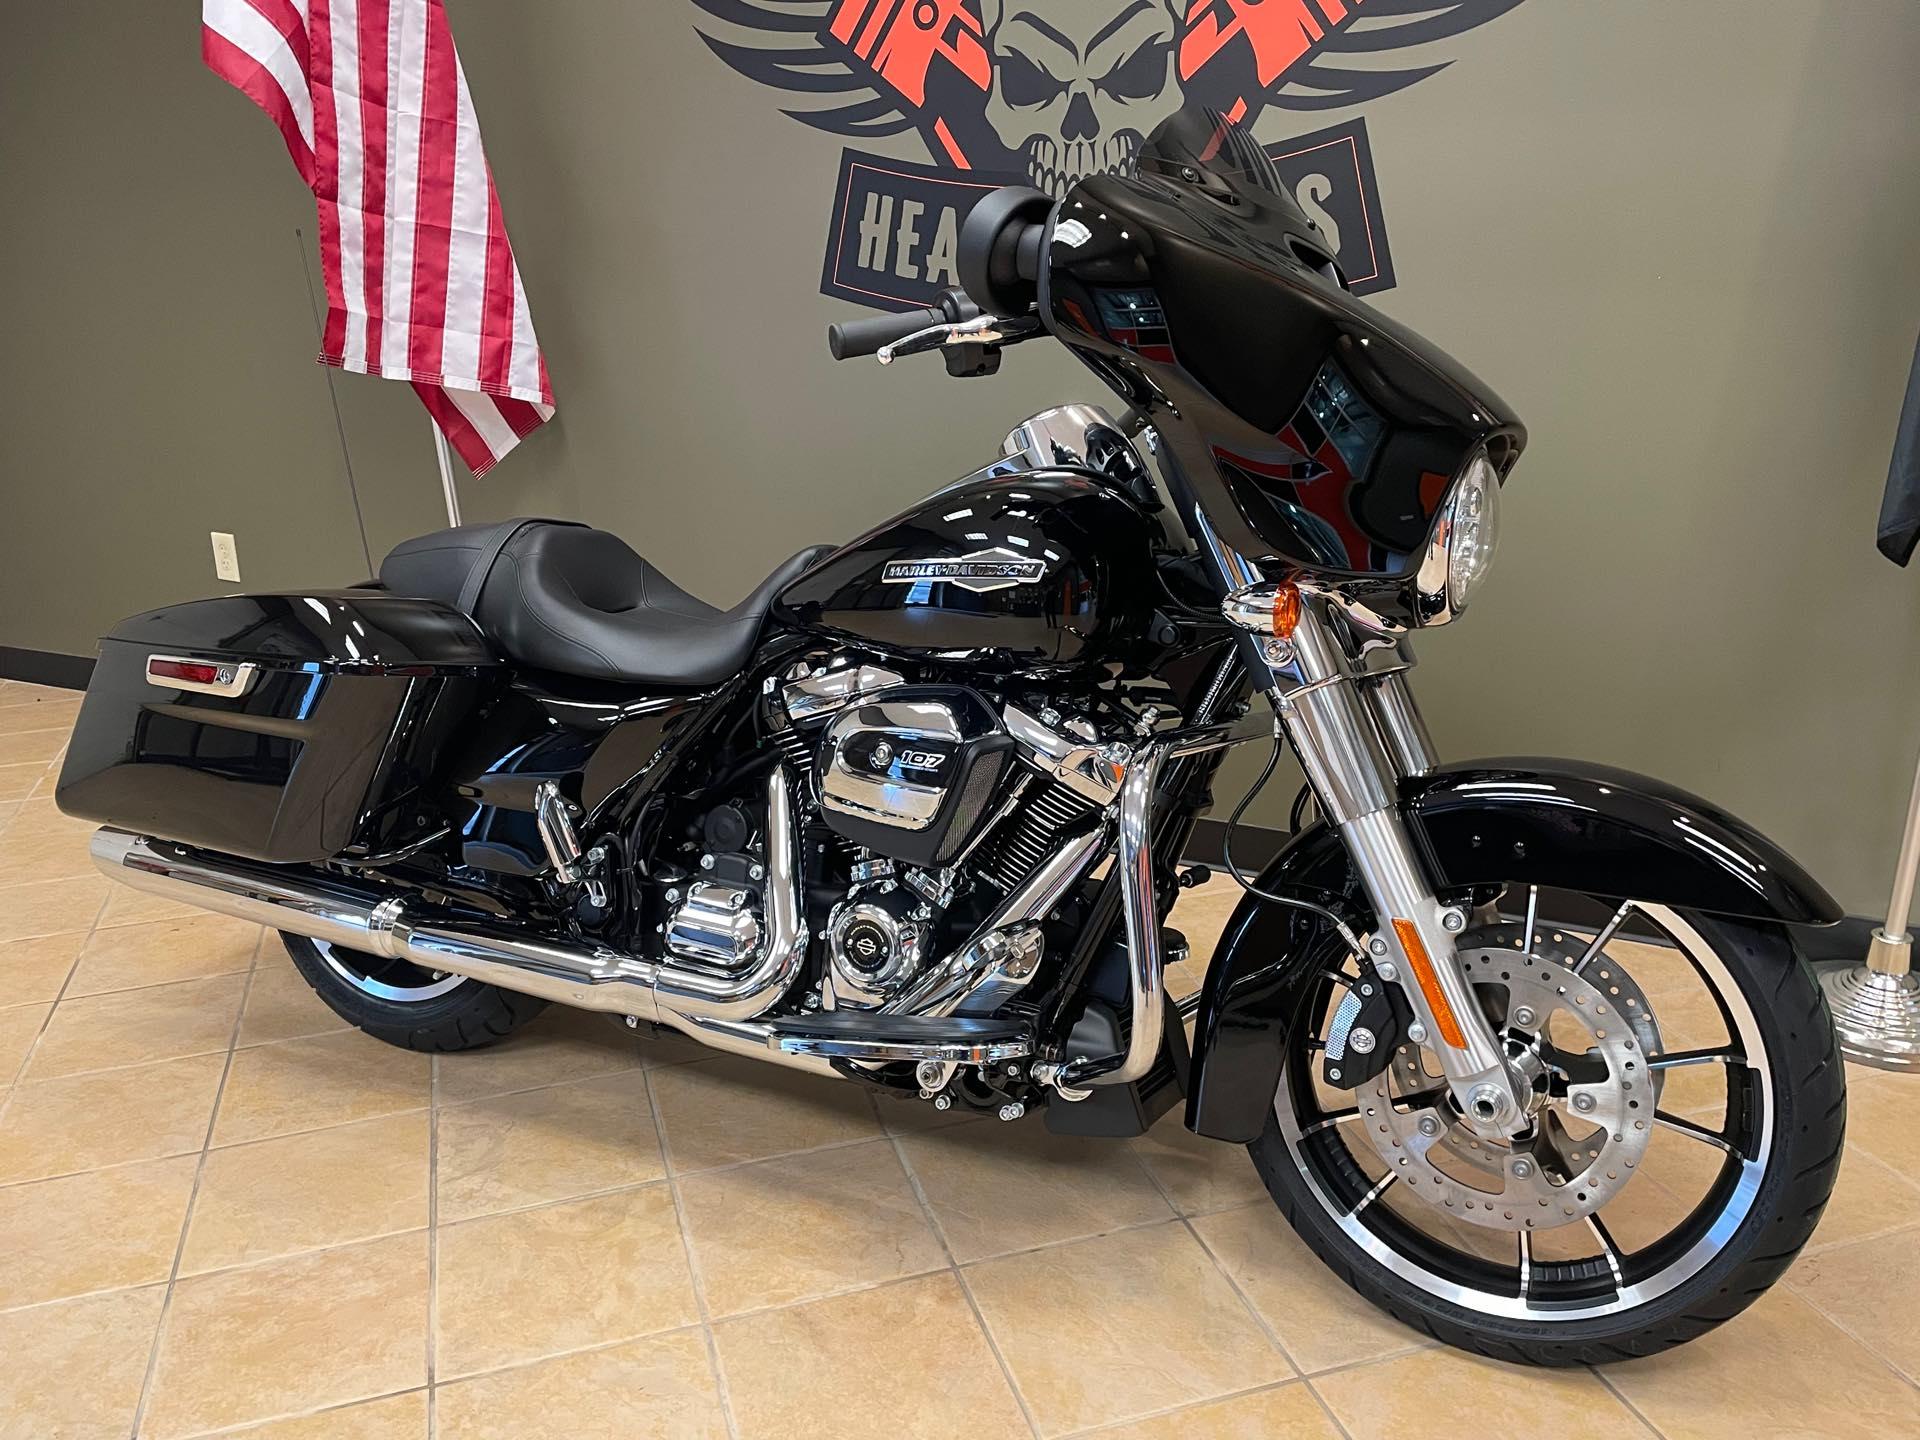 2021 Harley-Davidson Grand American Touring Street Glide at Loess Hills Harley-Davidson